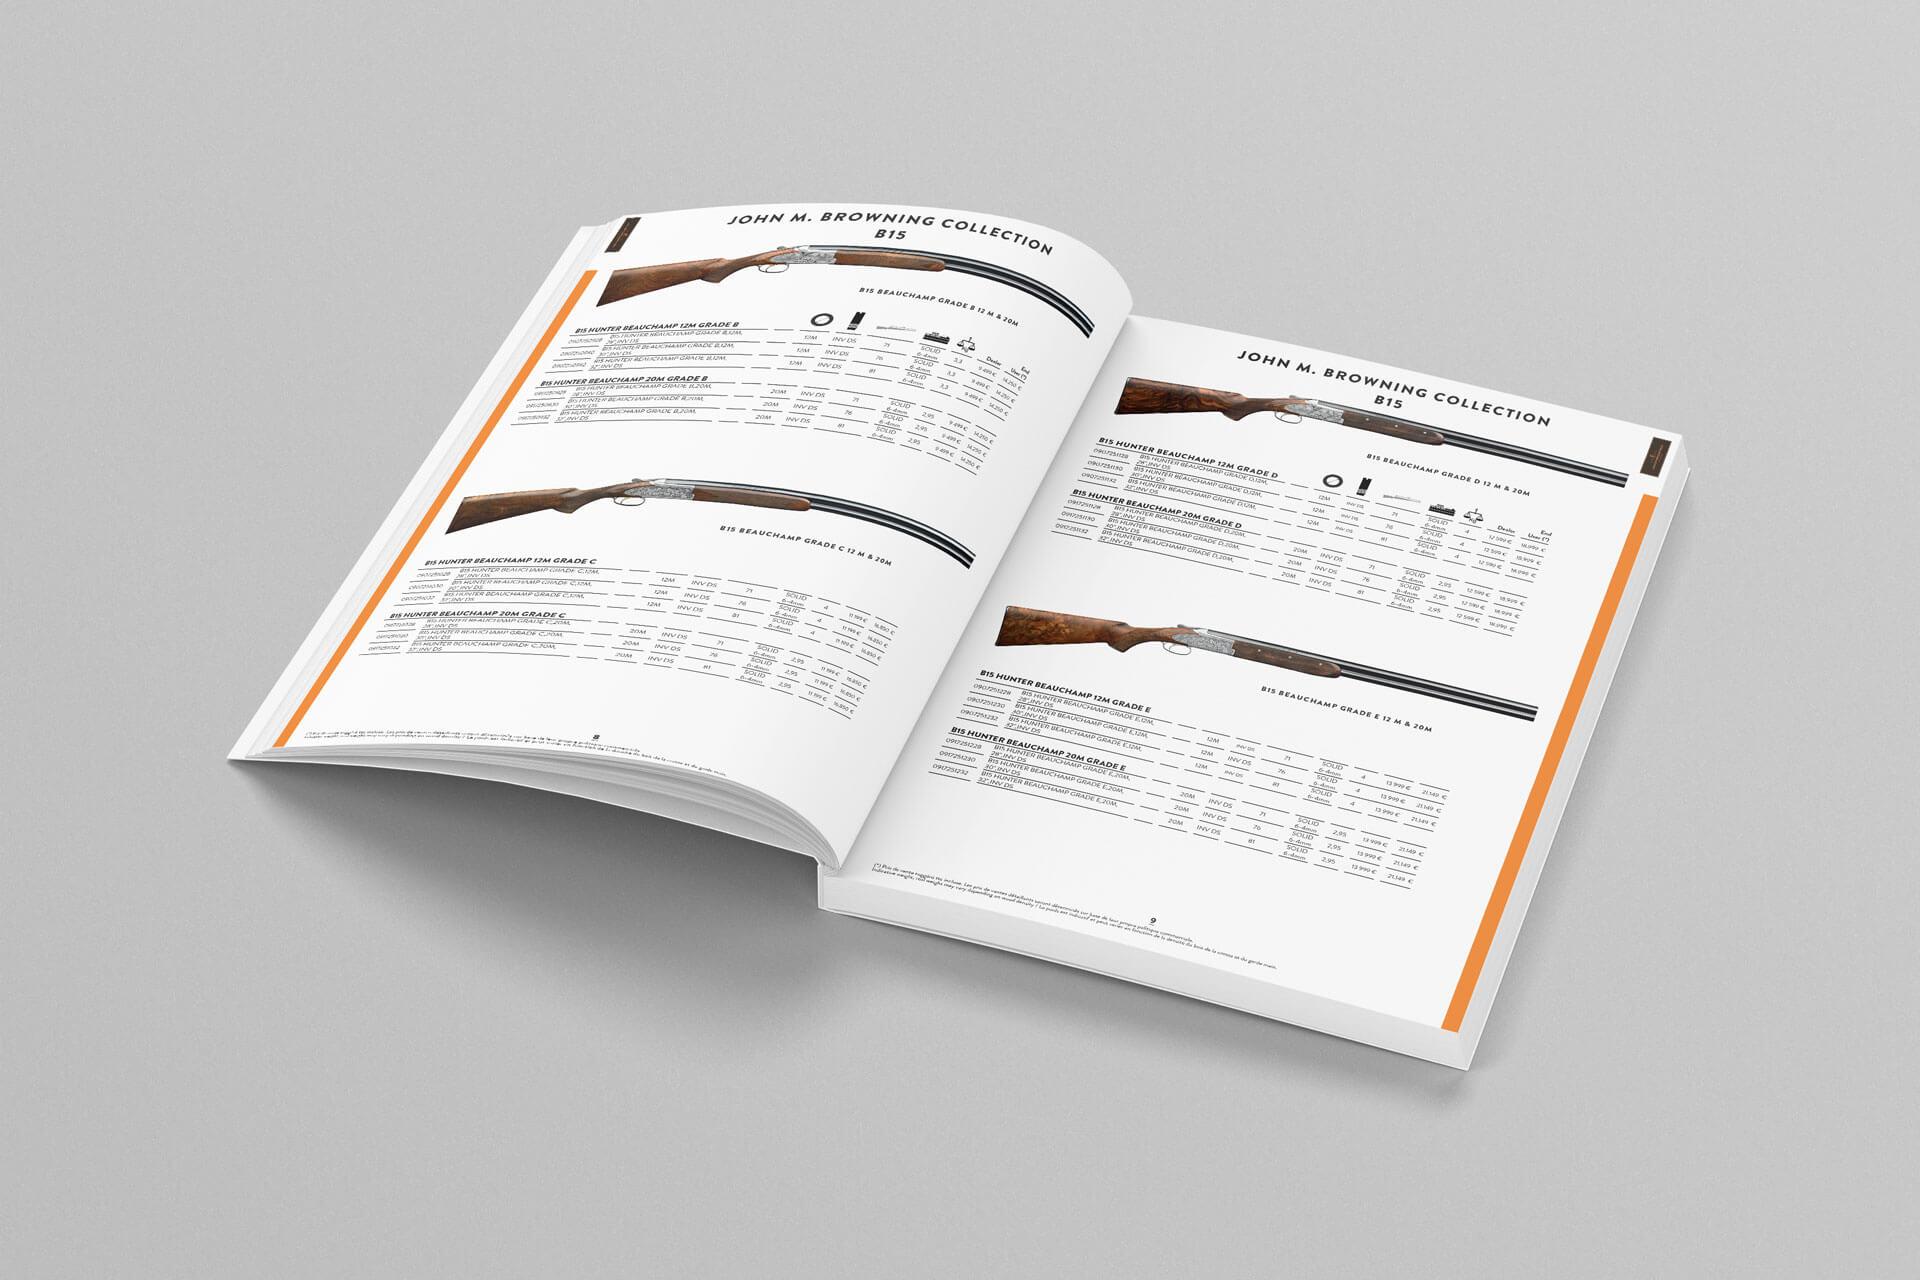 Browning Workbook 1